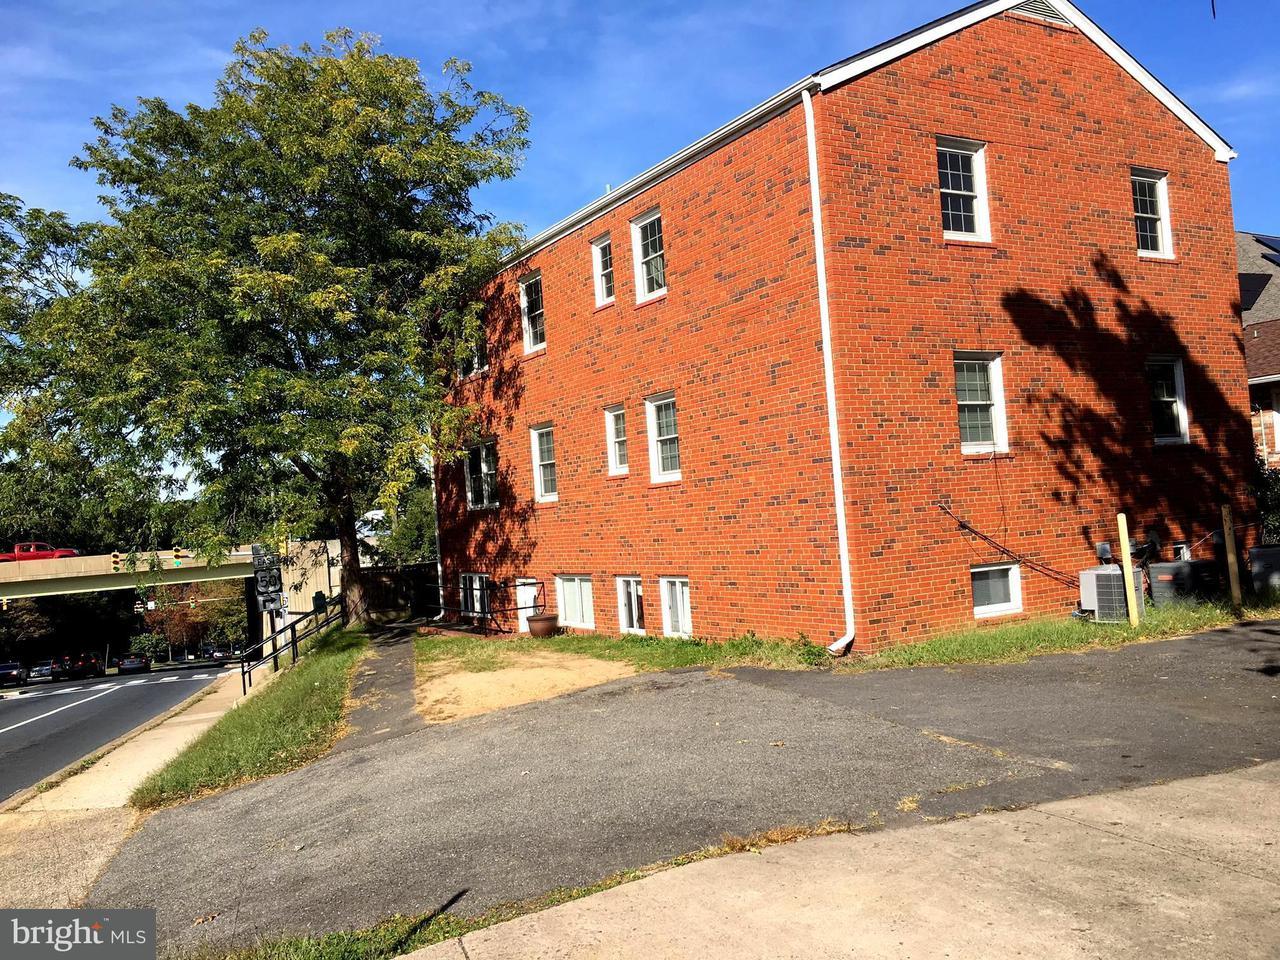 Single Family Home for Sale at 5814 ARLINGTON BLVD 5814 ARLINGTON BLVD Arlington, Virginia 22204 United States